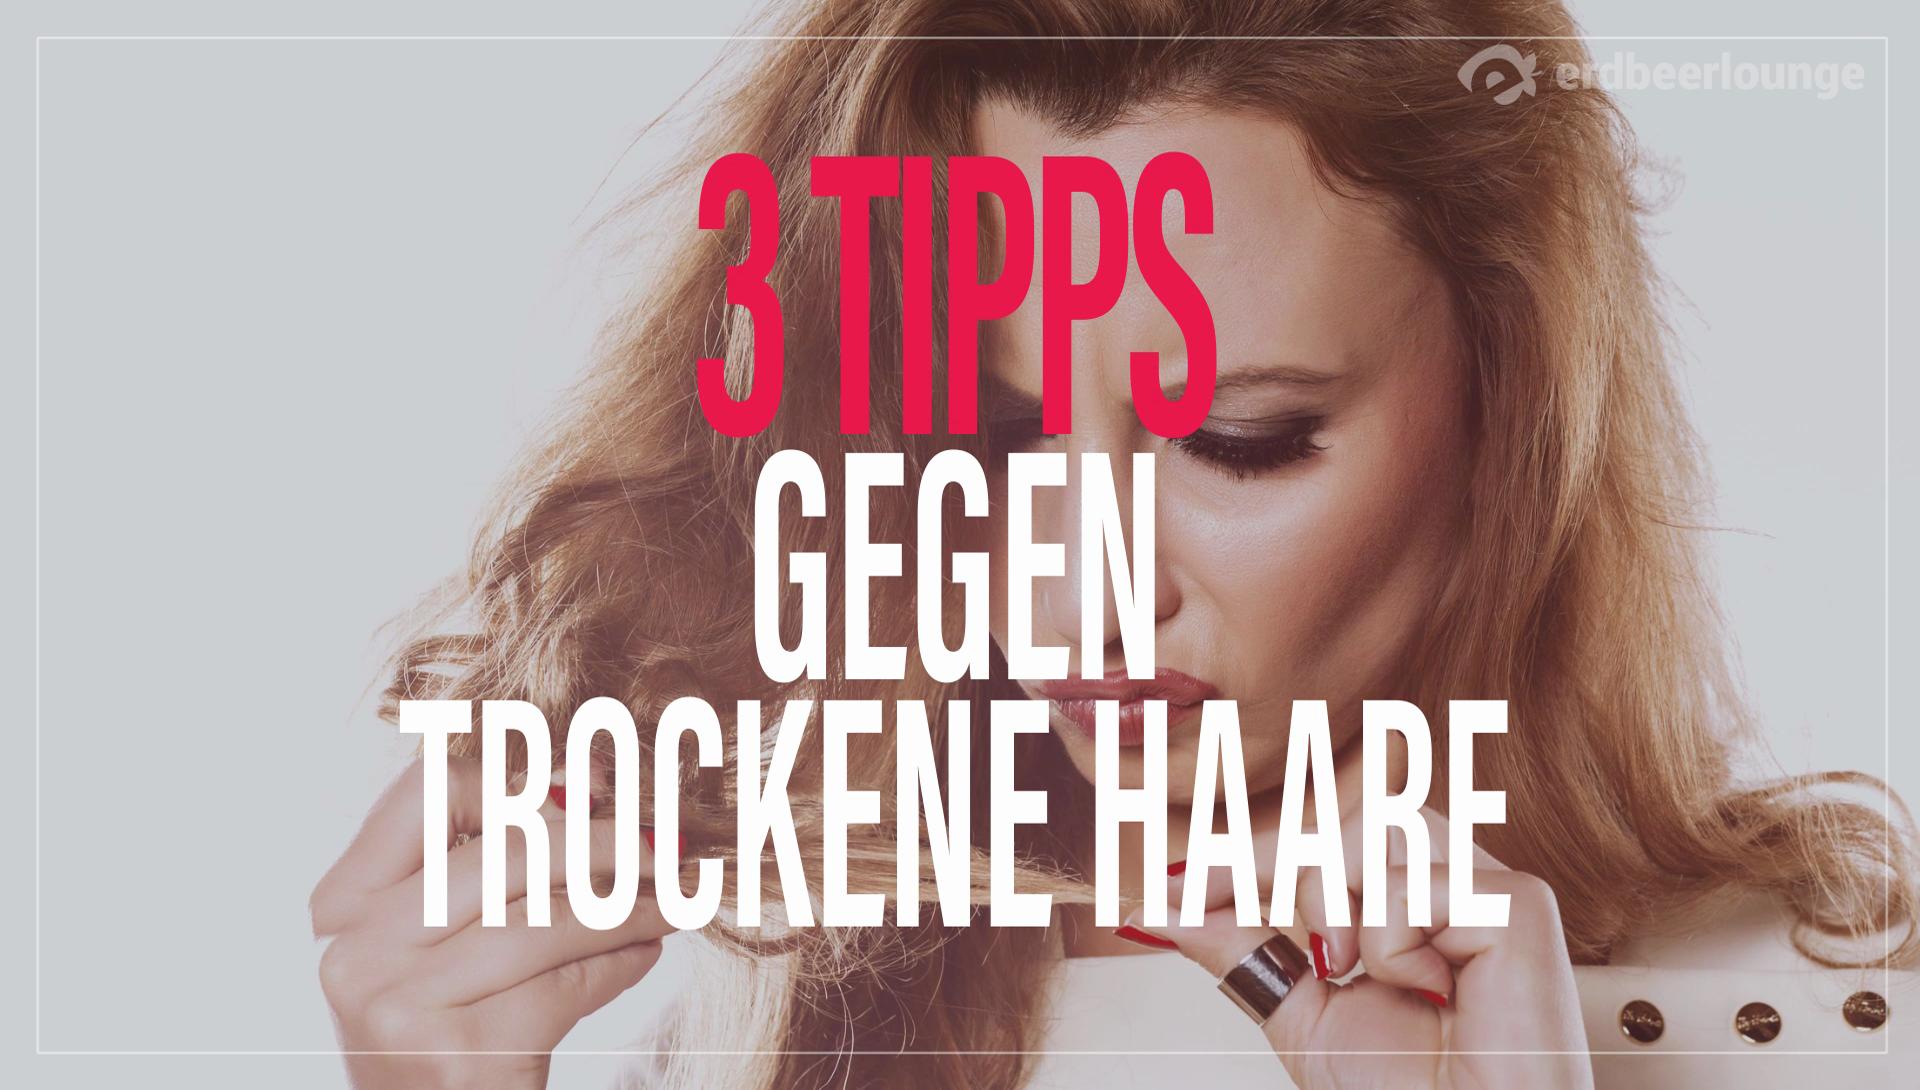 Trockene Haare Die Besten Tipps Tricks Desiredde